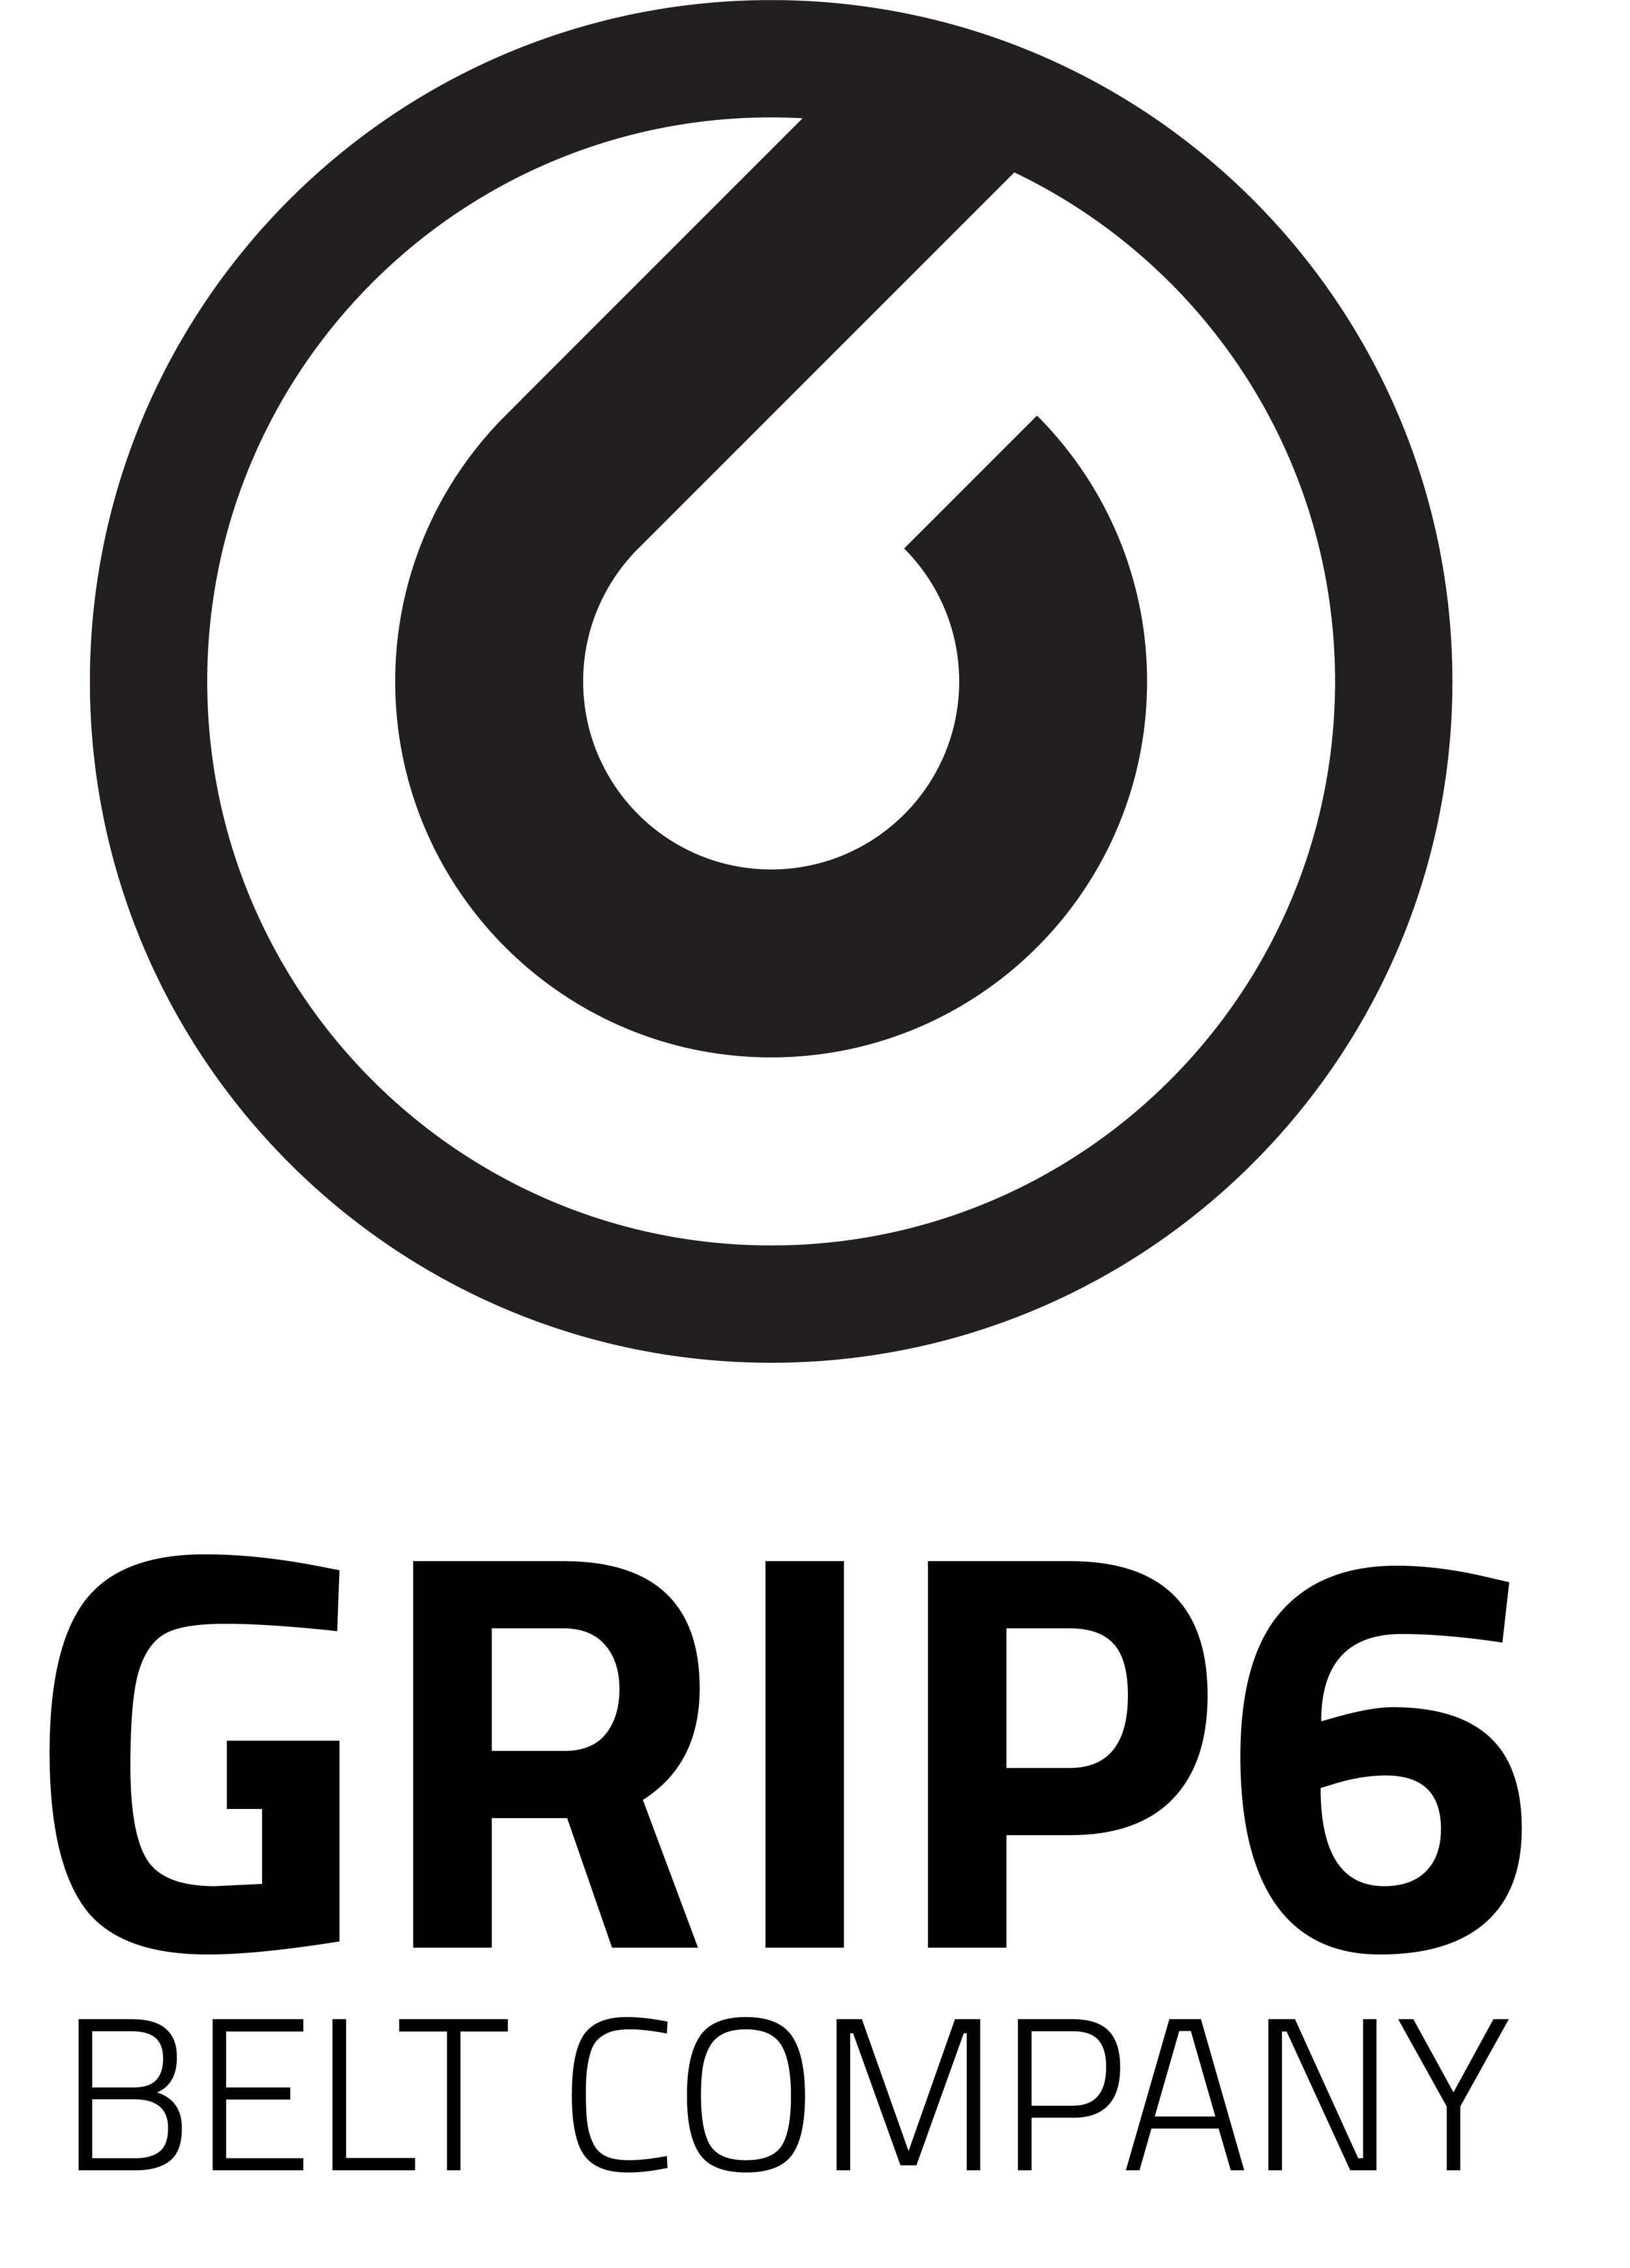 GRIP6-LOGO-PACK_01.jpg